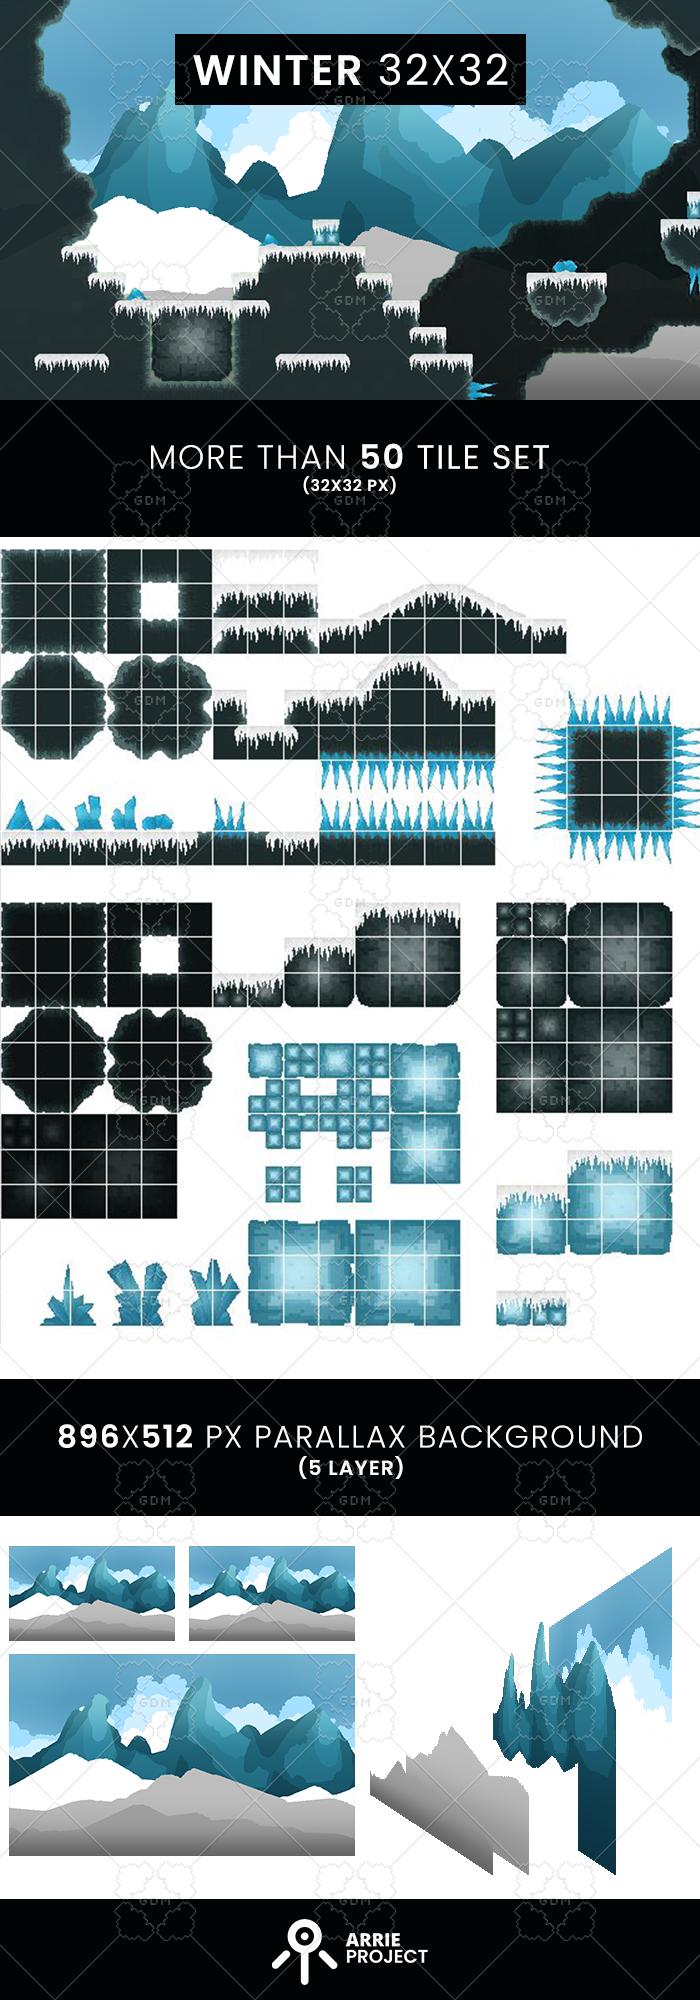 Winter tile set 32×32